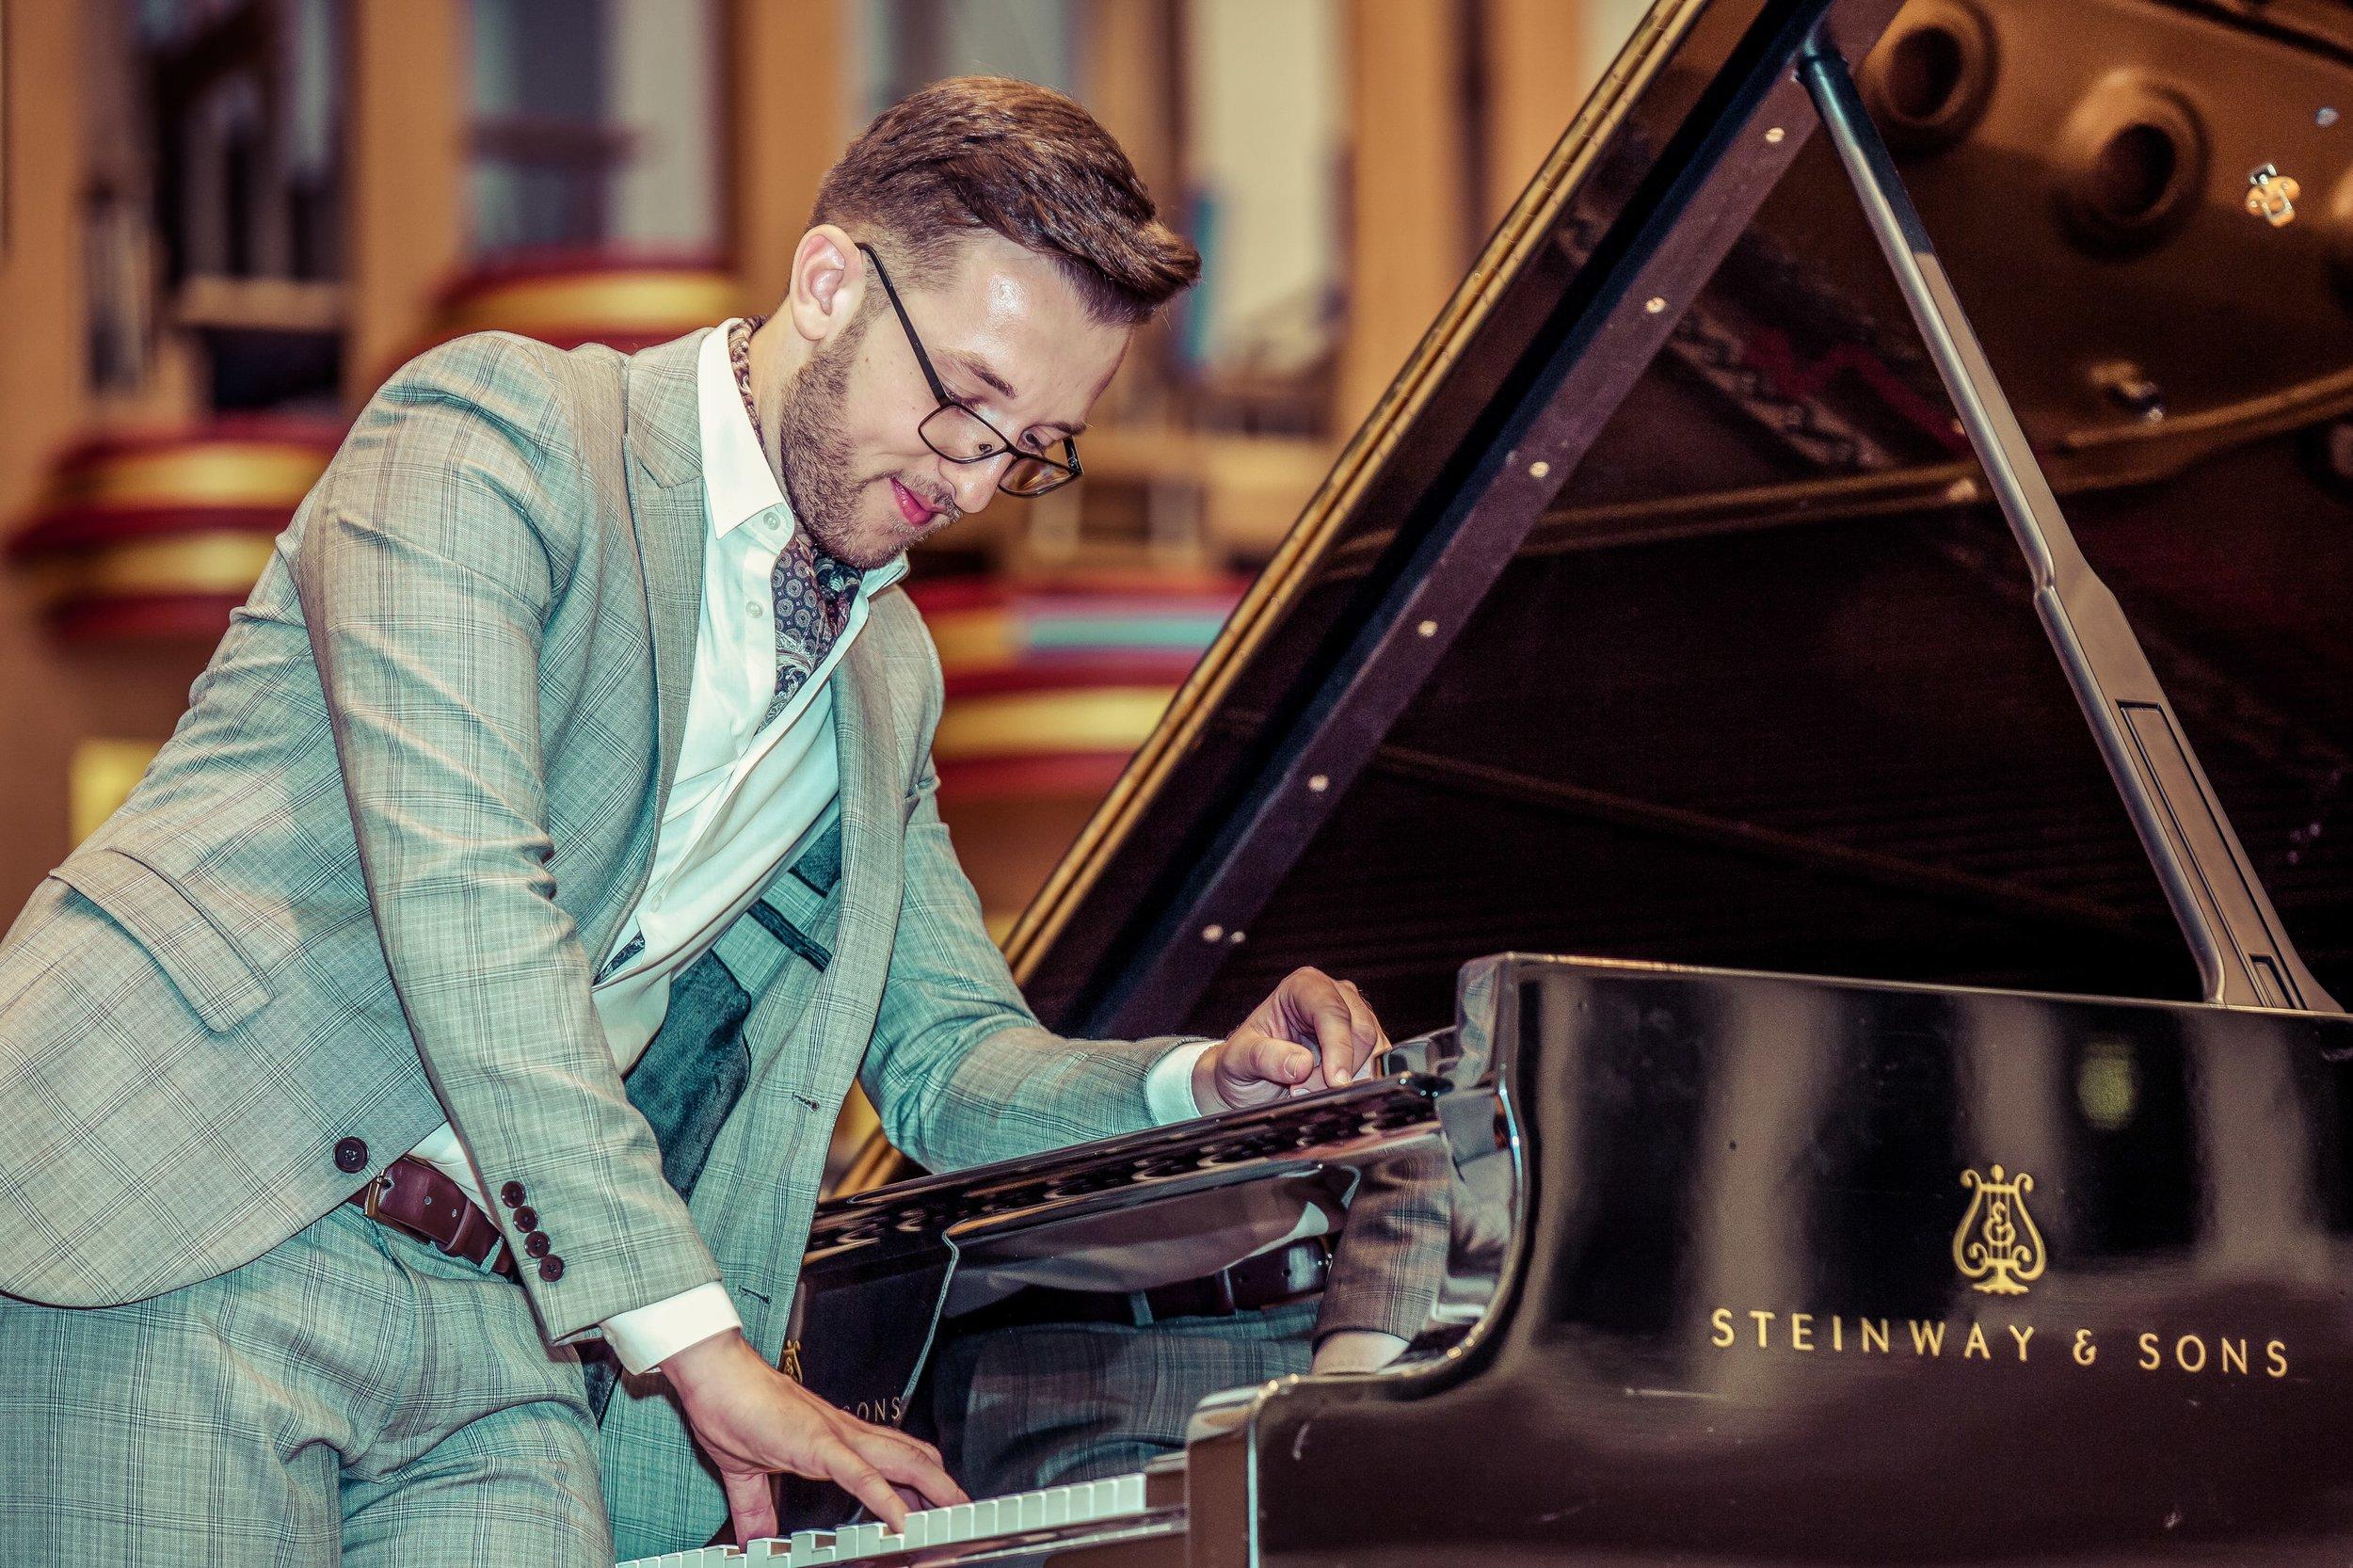 Nicu - Royal Music Academy, photo by Cristina Schek (266)-min.jpg